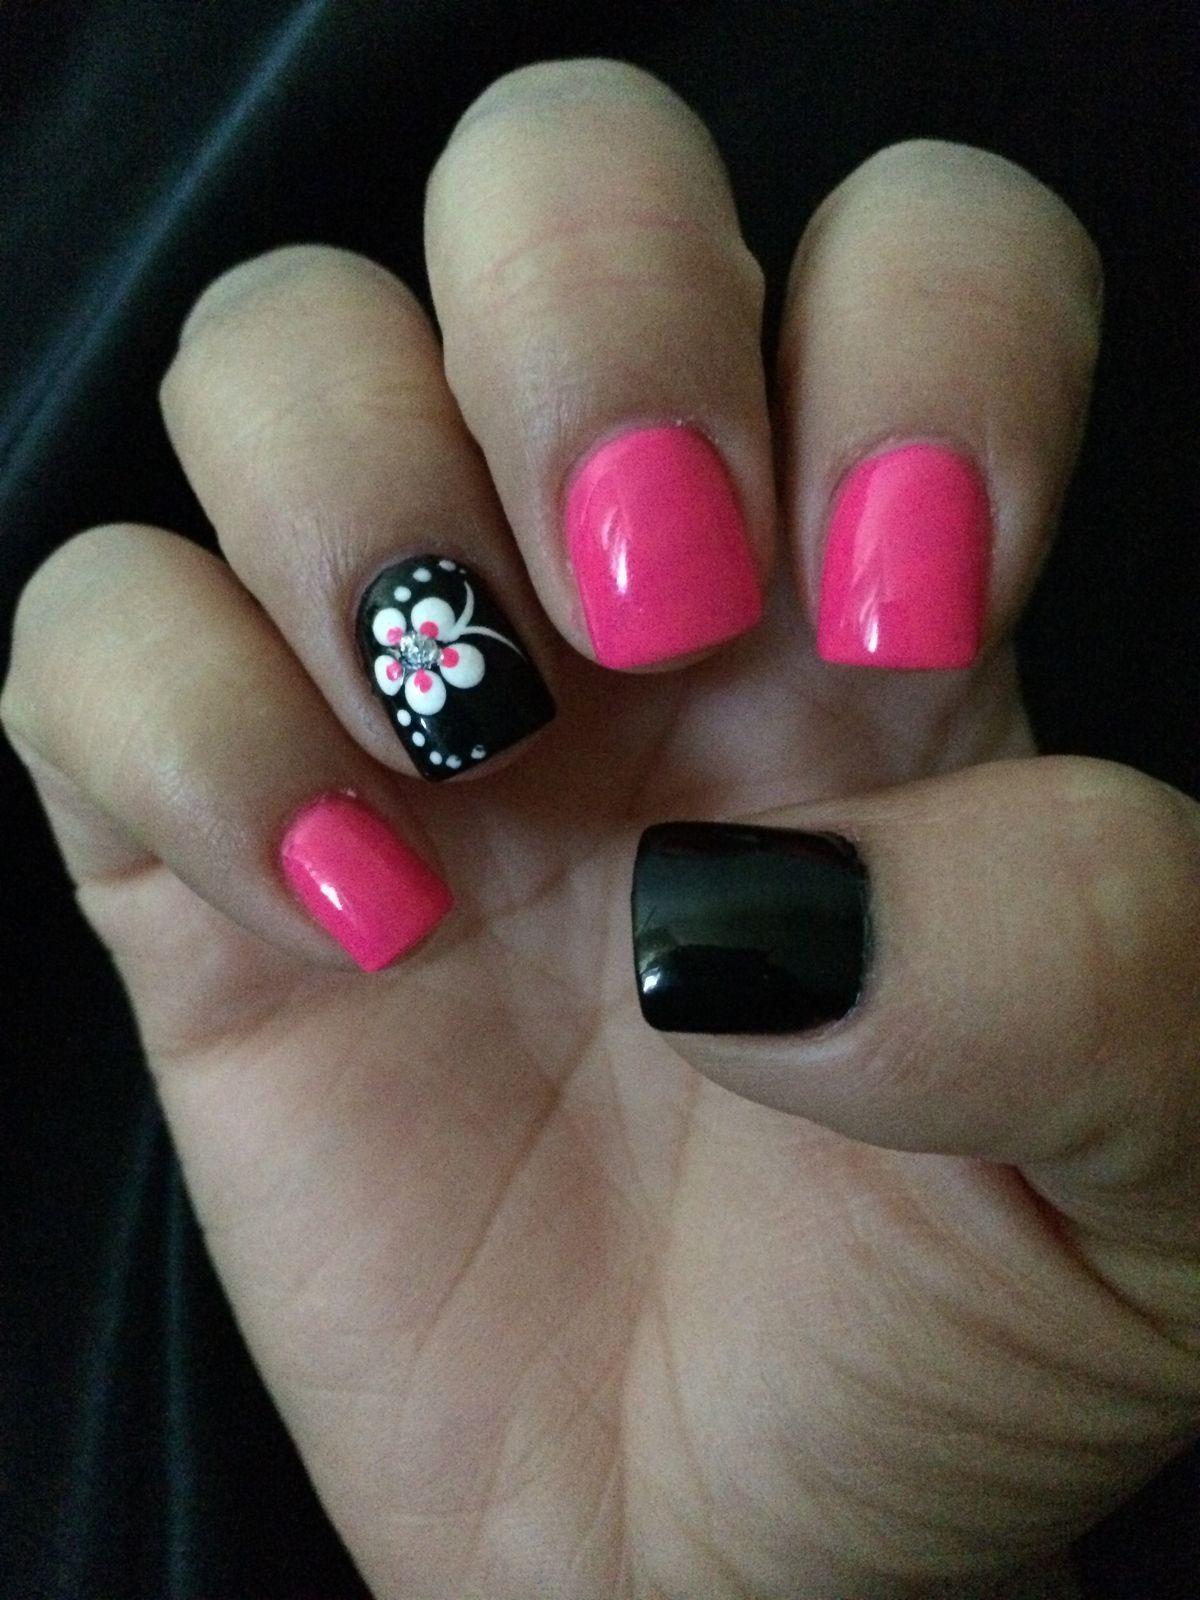 Pin de Kelli Parr en Nail Designs   Pinterest   Diseños de uñas ...